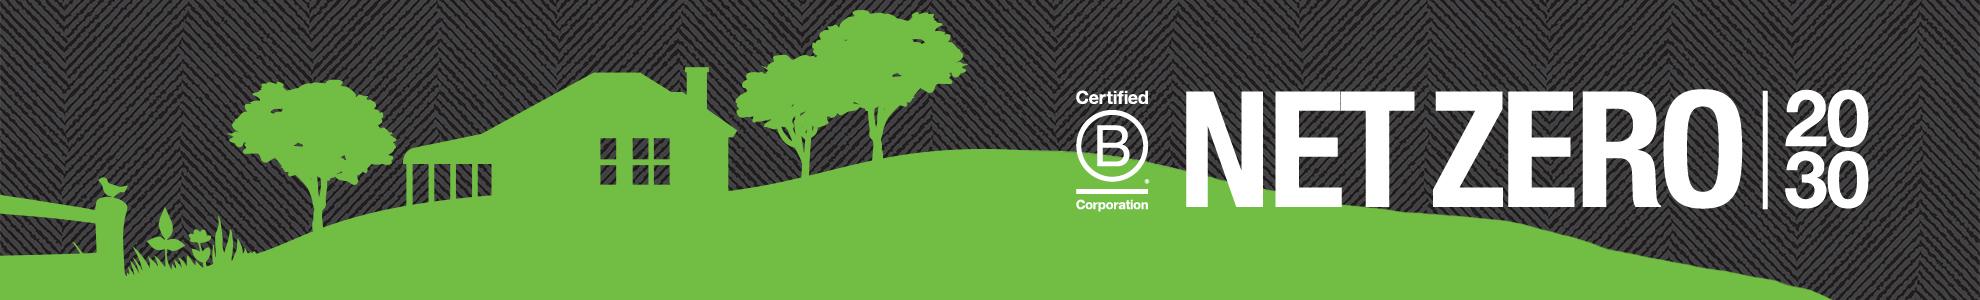 sustainability-website-banner.jpg